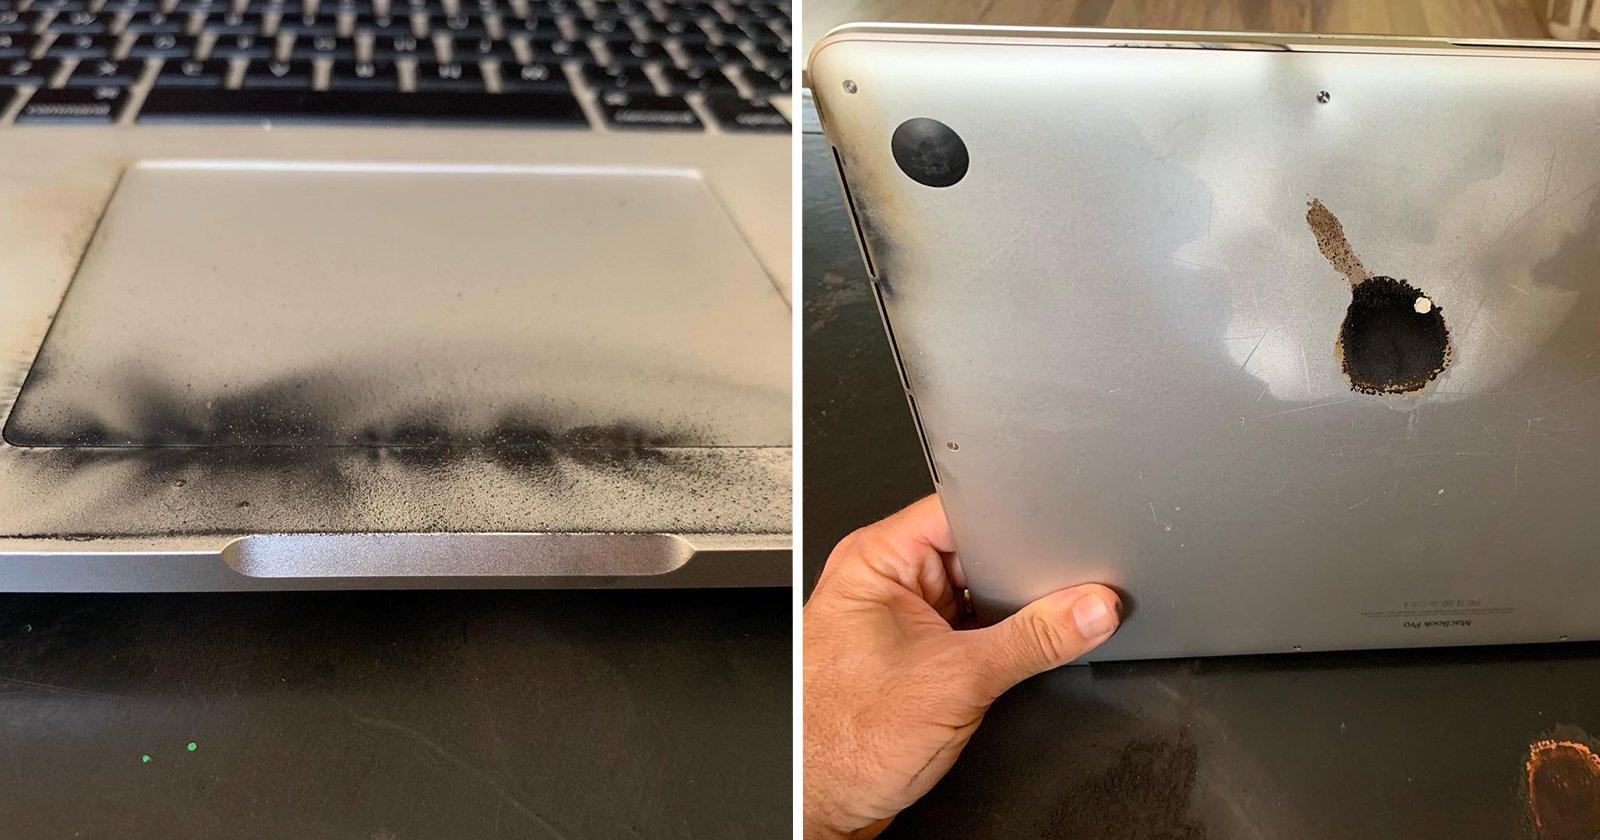 Apple's MacBook Pro Battery Recall is No Joke, Here's What Could Happen